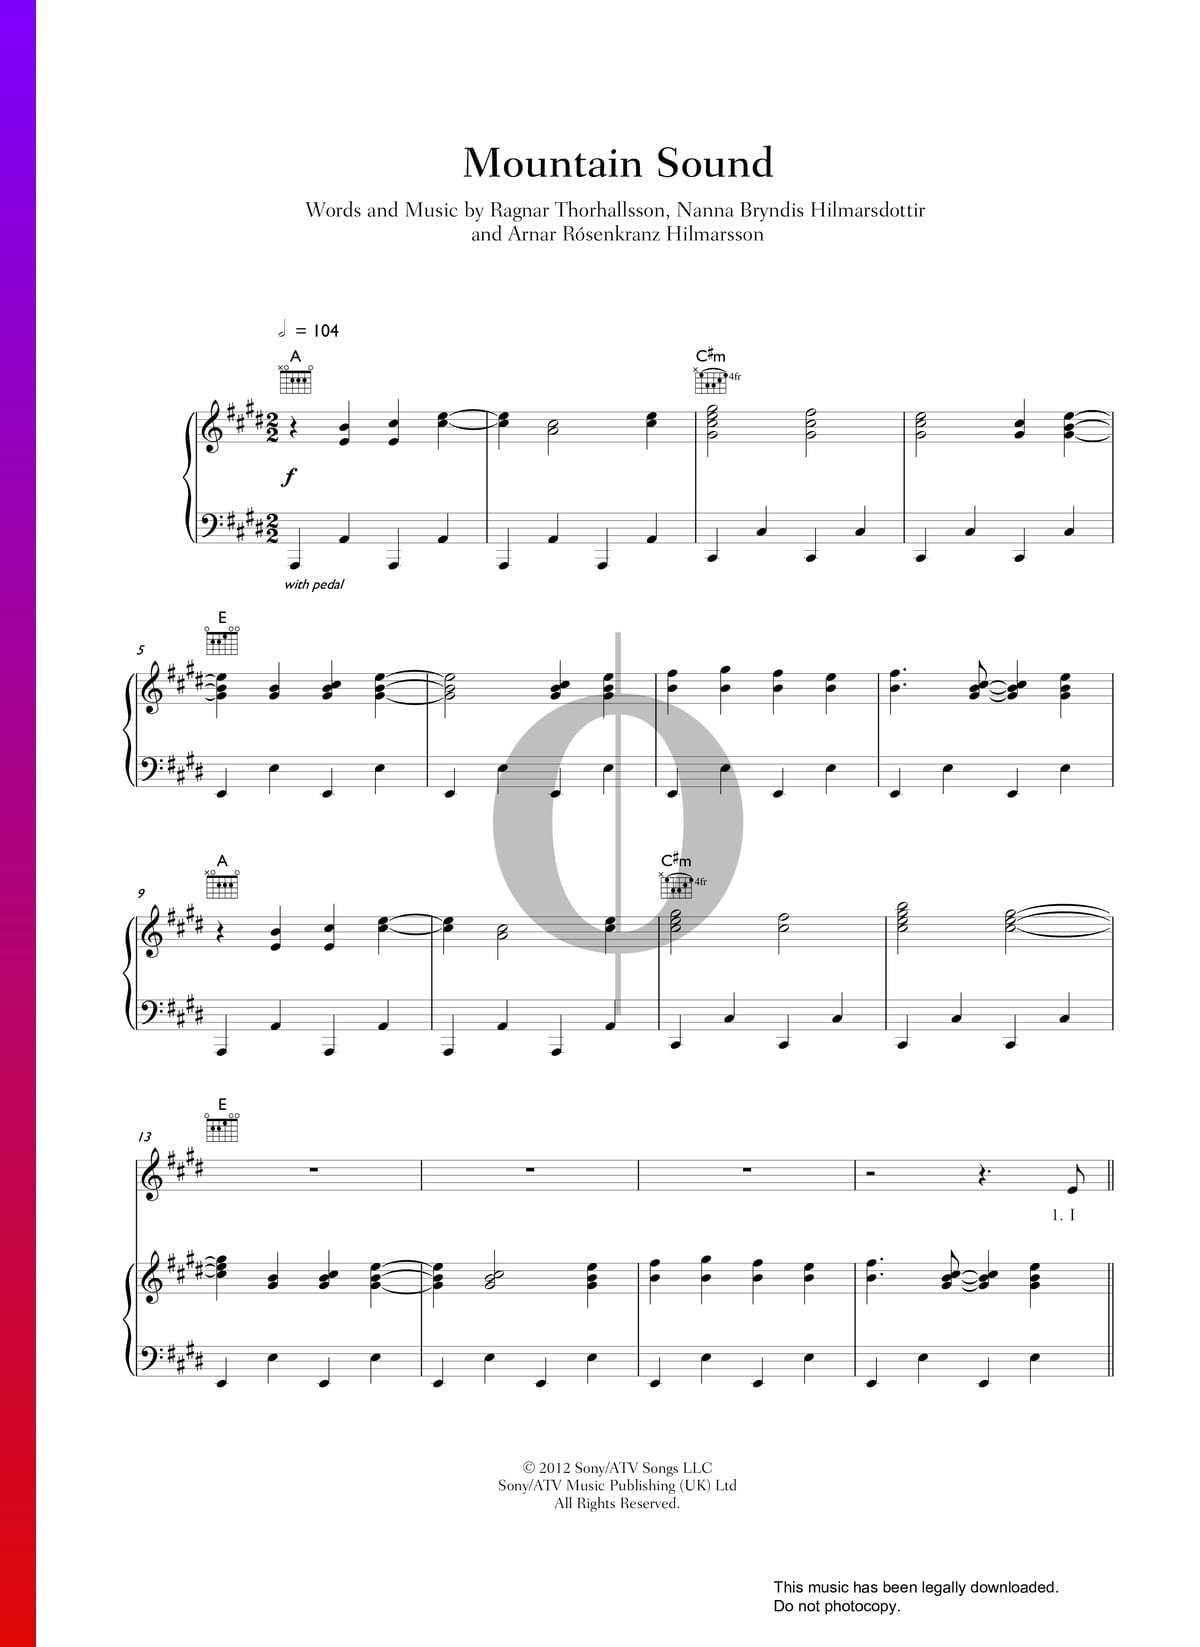 ▷ Mountain Sound Sheet Music (Piano, Voice, Guitar) - PDF Download